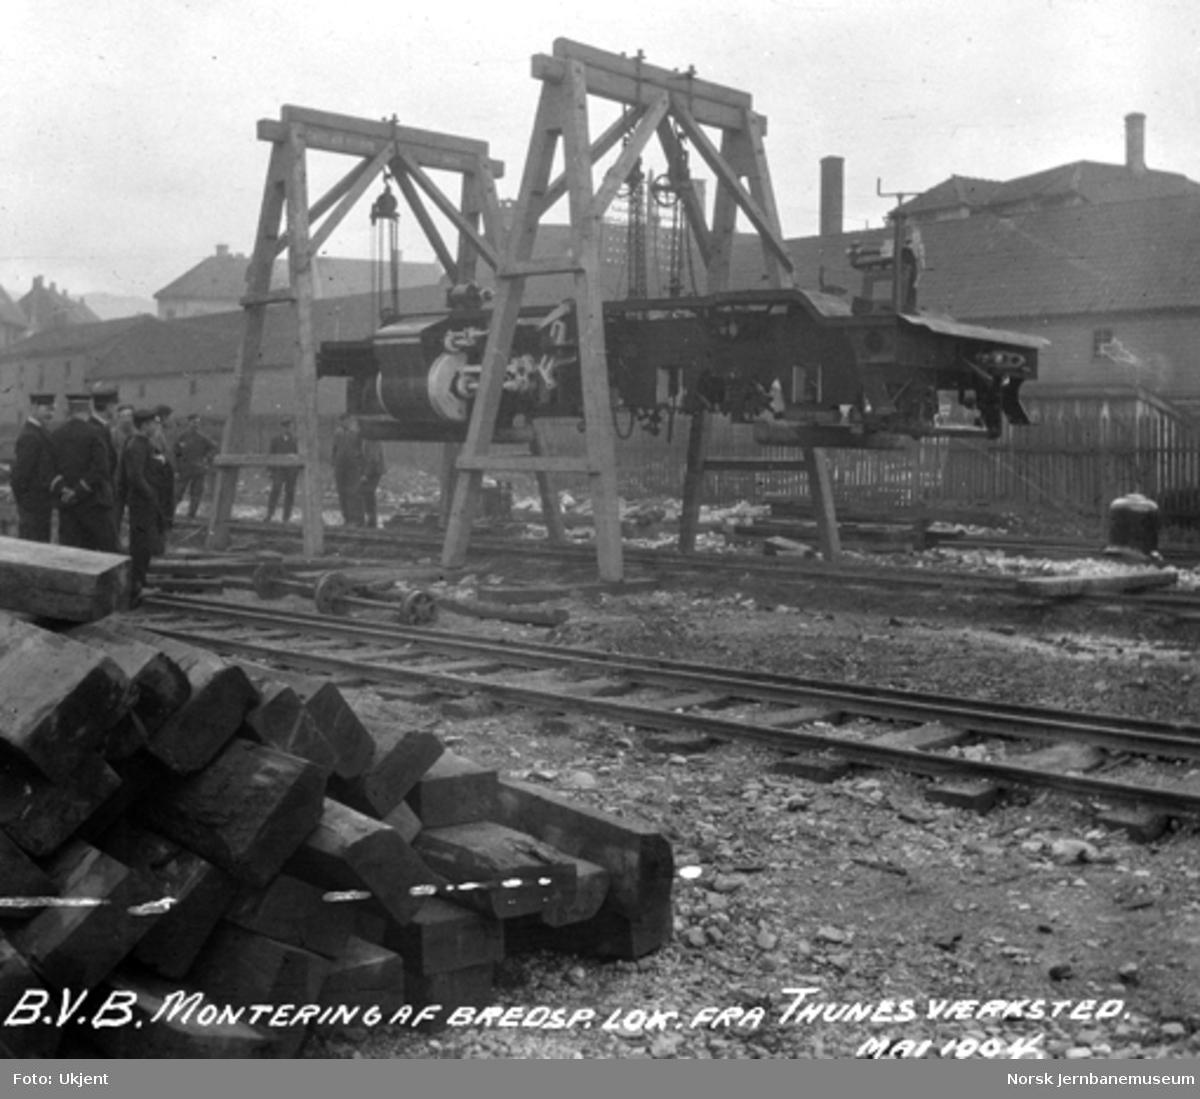 Normalspormateriell til Bergensbanen : ramme til damplokomotiv type 21a oppheist før hjulsetting